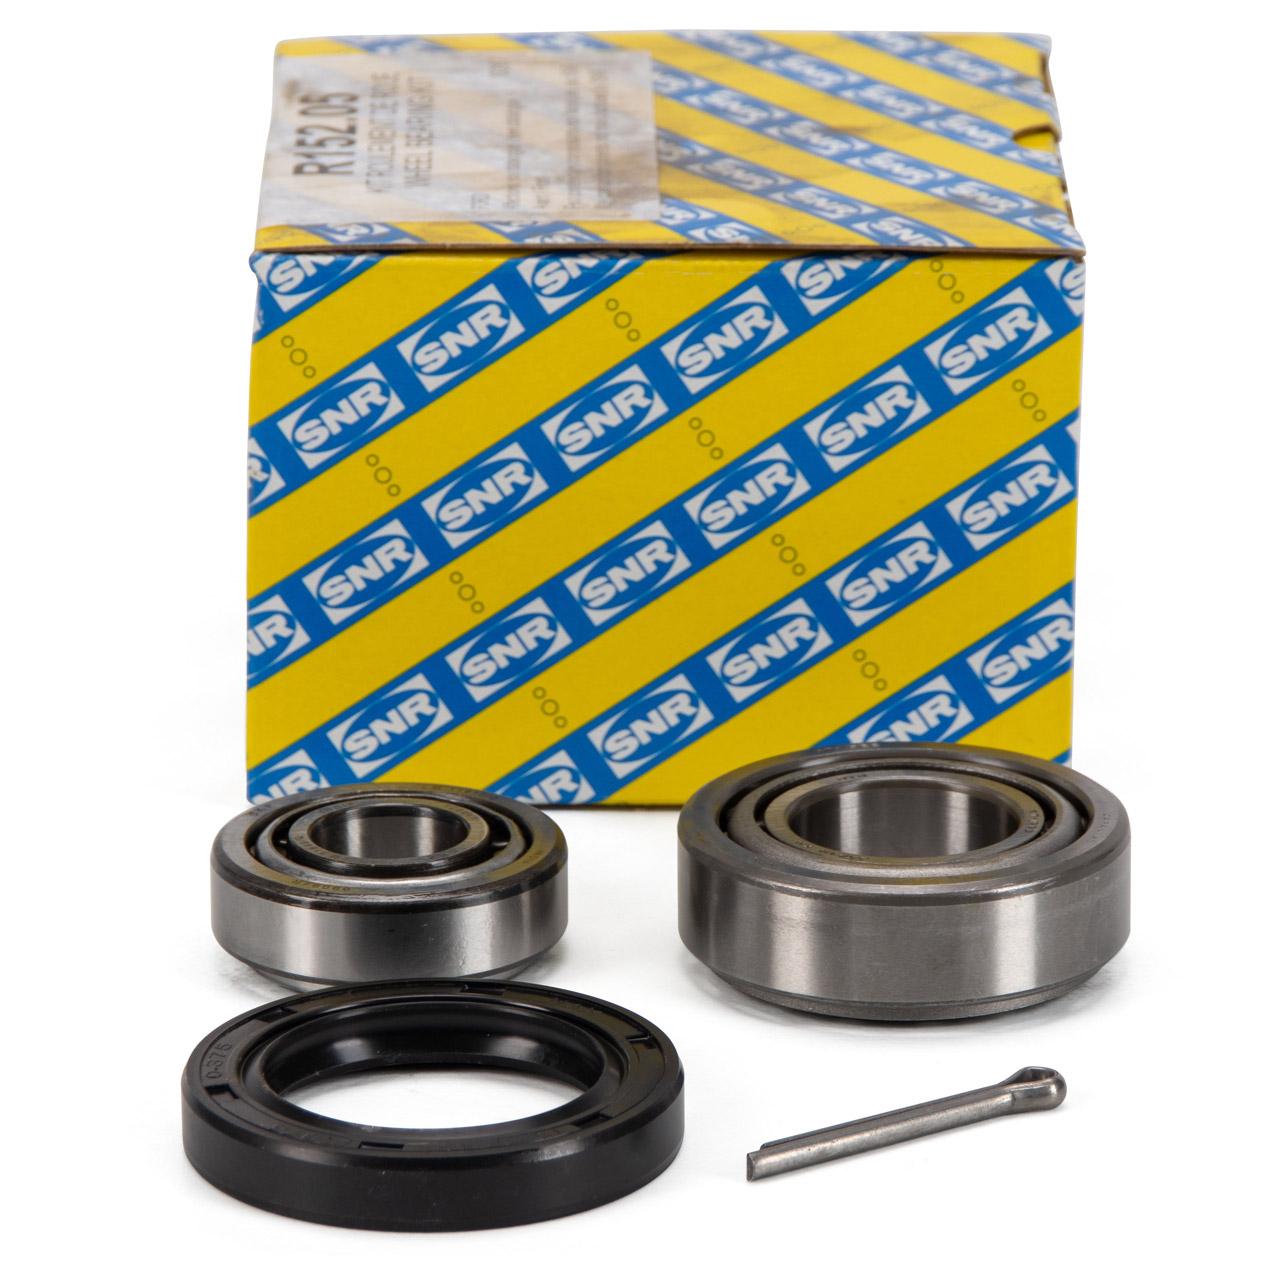 SNR R152.05 Radlagersatz FORD Capri 2 3 1.6-2.8i Turbo Escort 2 2.0 RS vorne